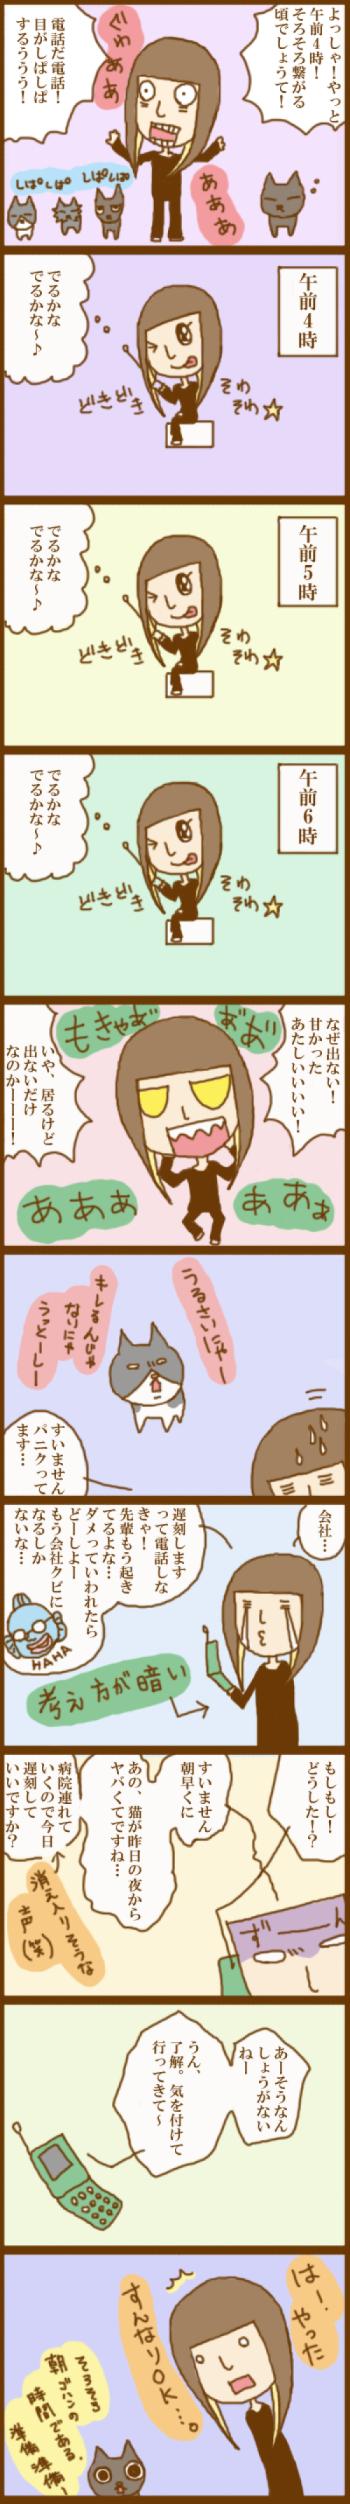 f:id:suzuokayu:20201116114753j:plain